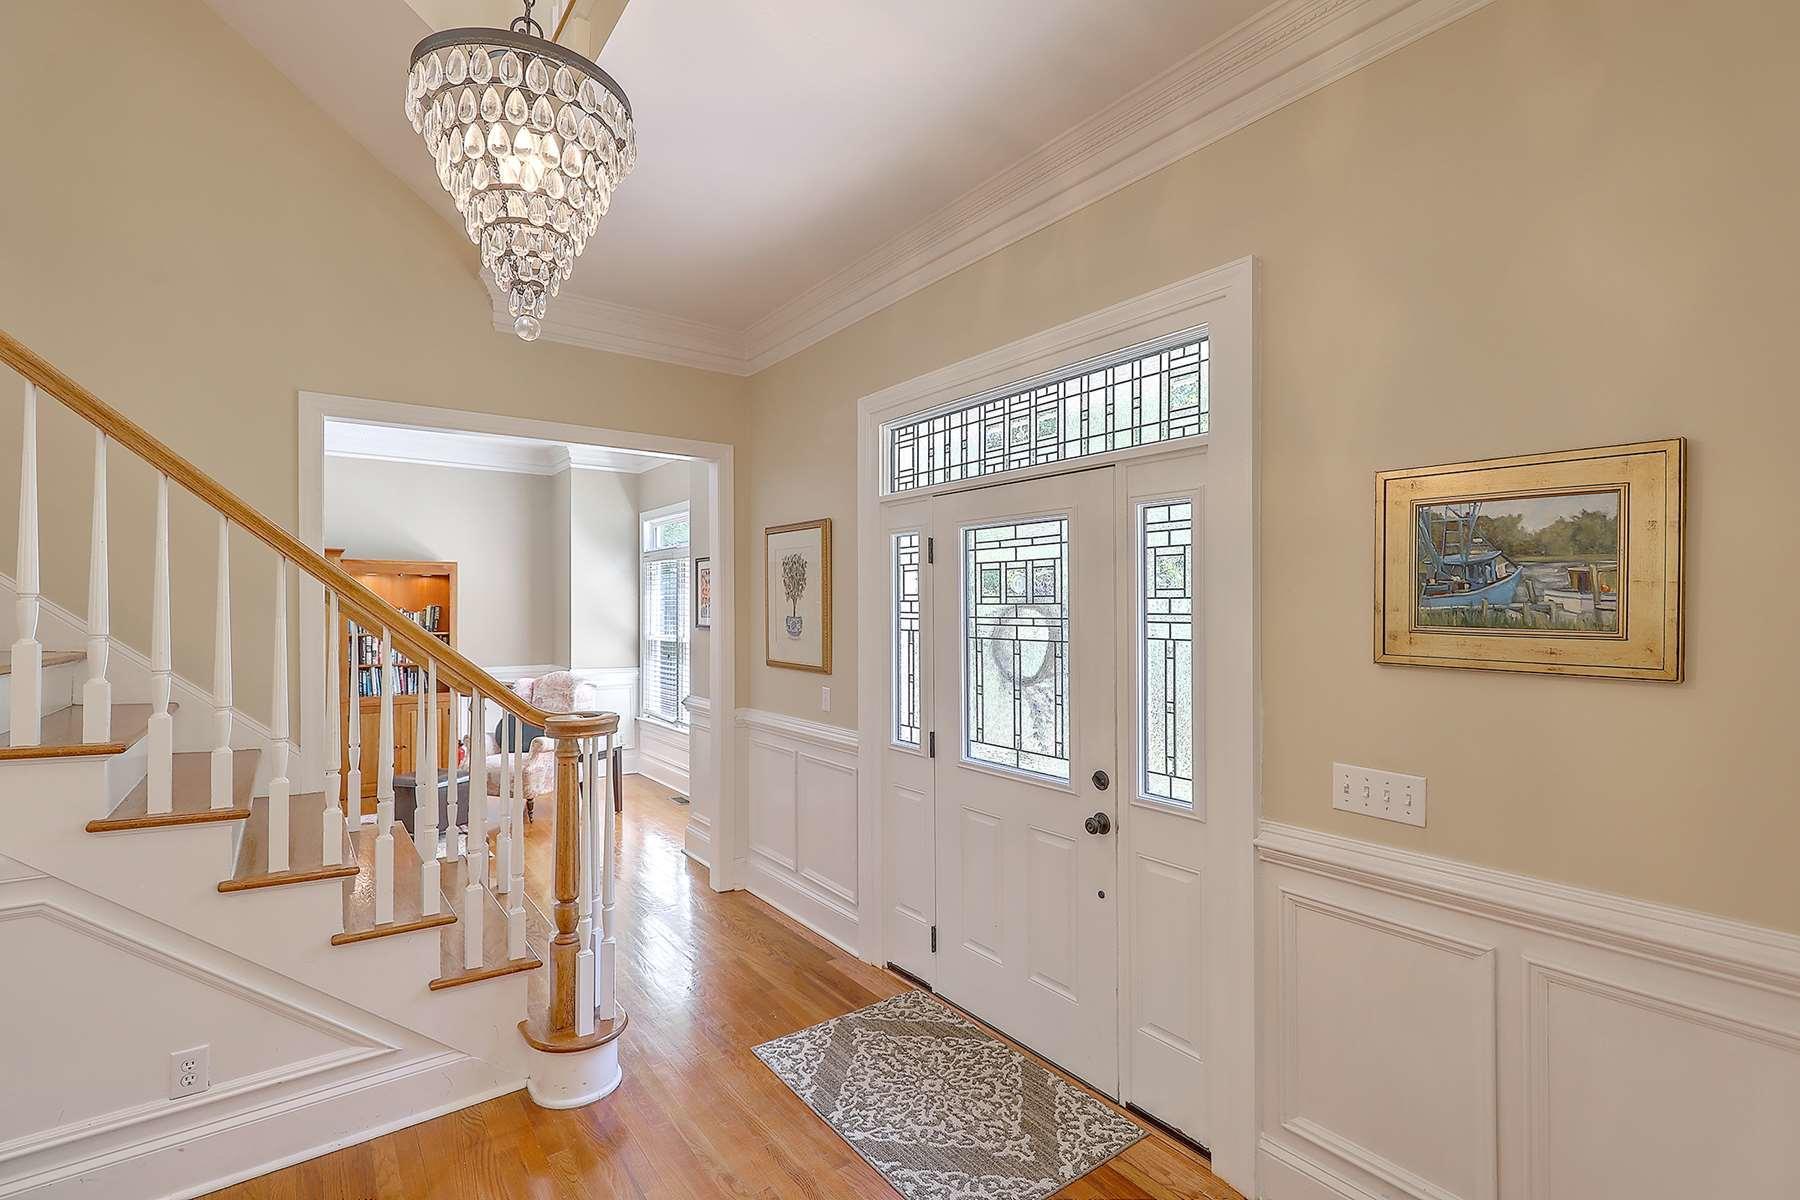 Dunes West Homes For Sale - 2961 Pignatelli, Mount Pleasant, SC - 32